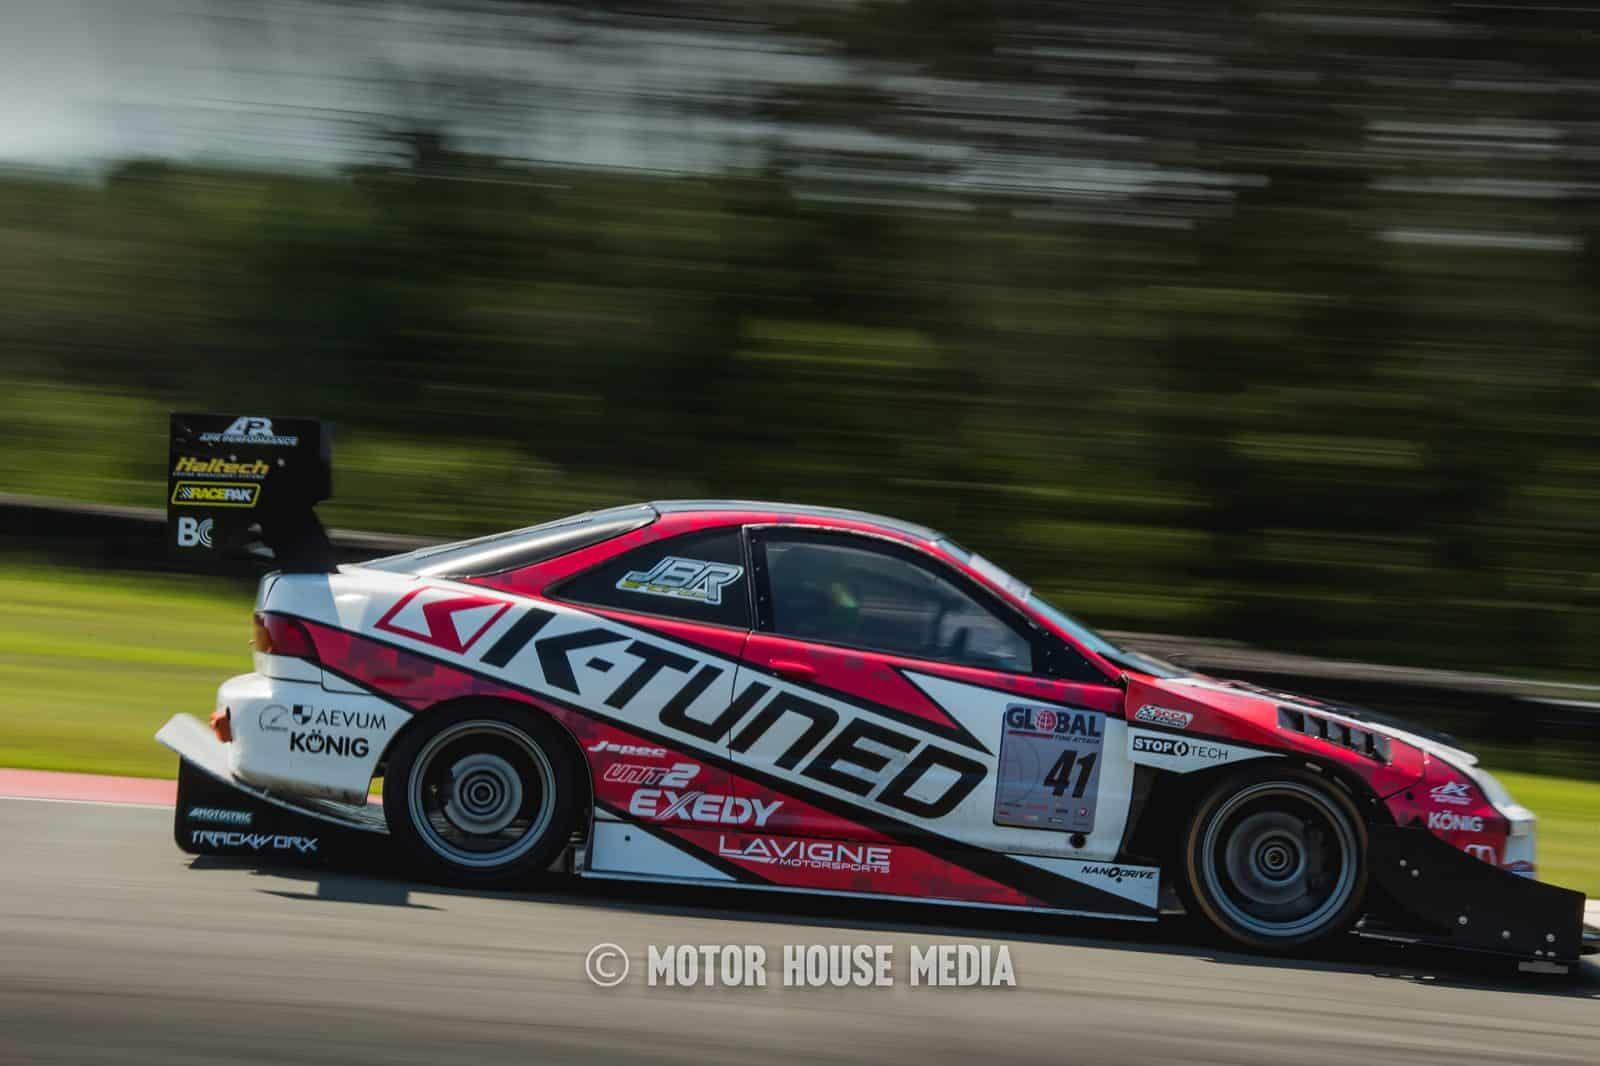 Ktuned Honda of Global Time Attack racing